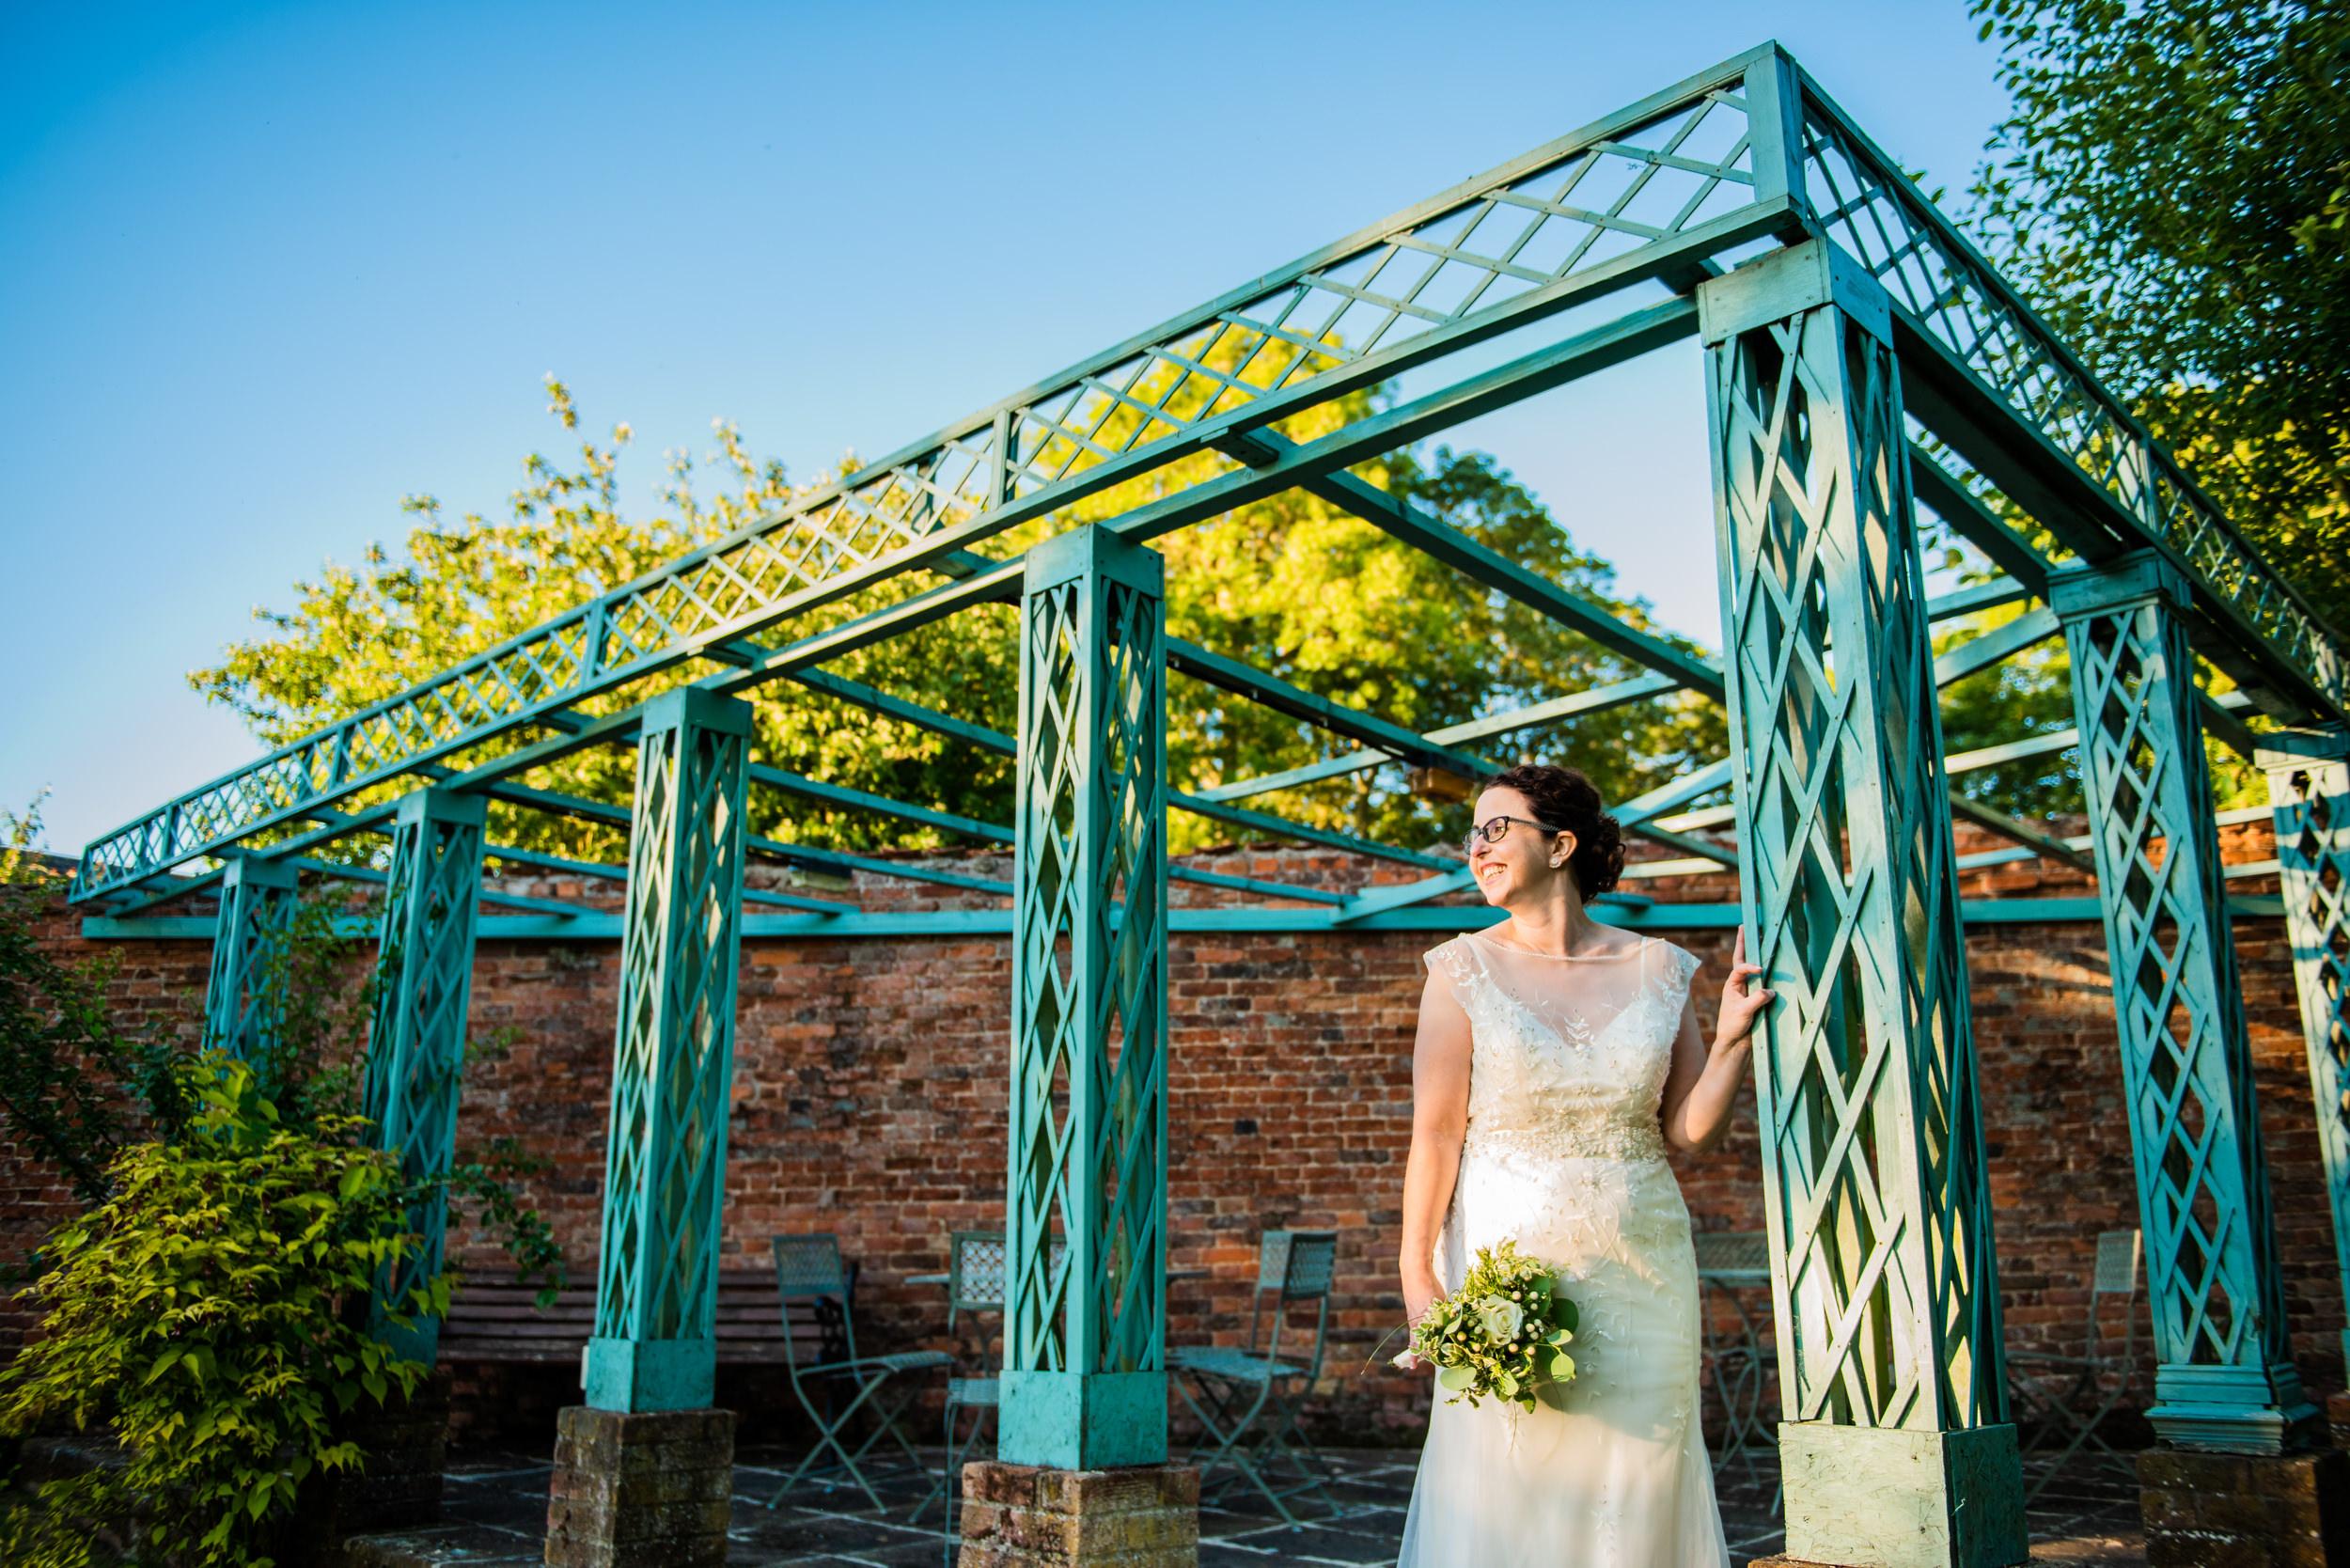 Bridal portrait outside in beautiful venue gardens